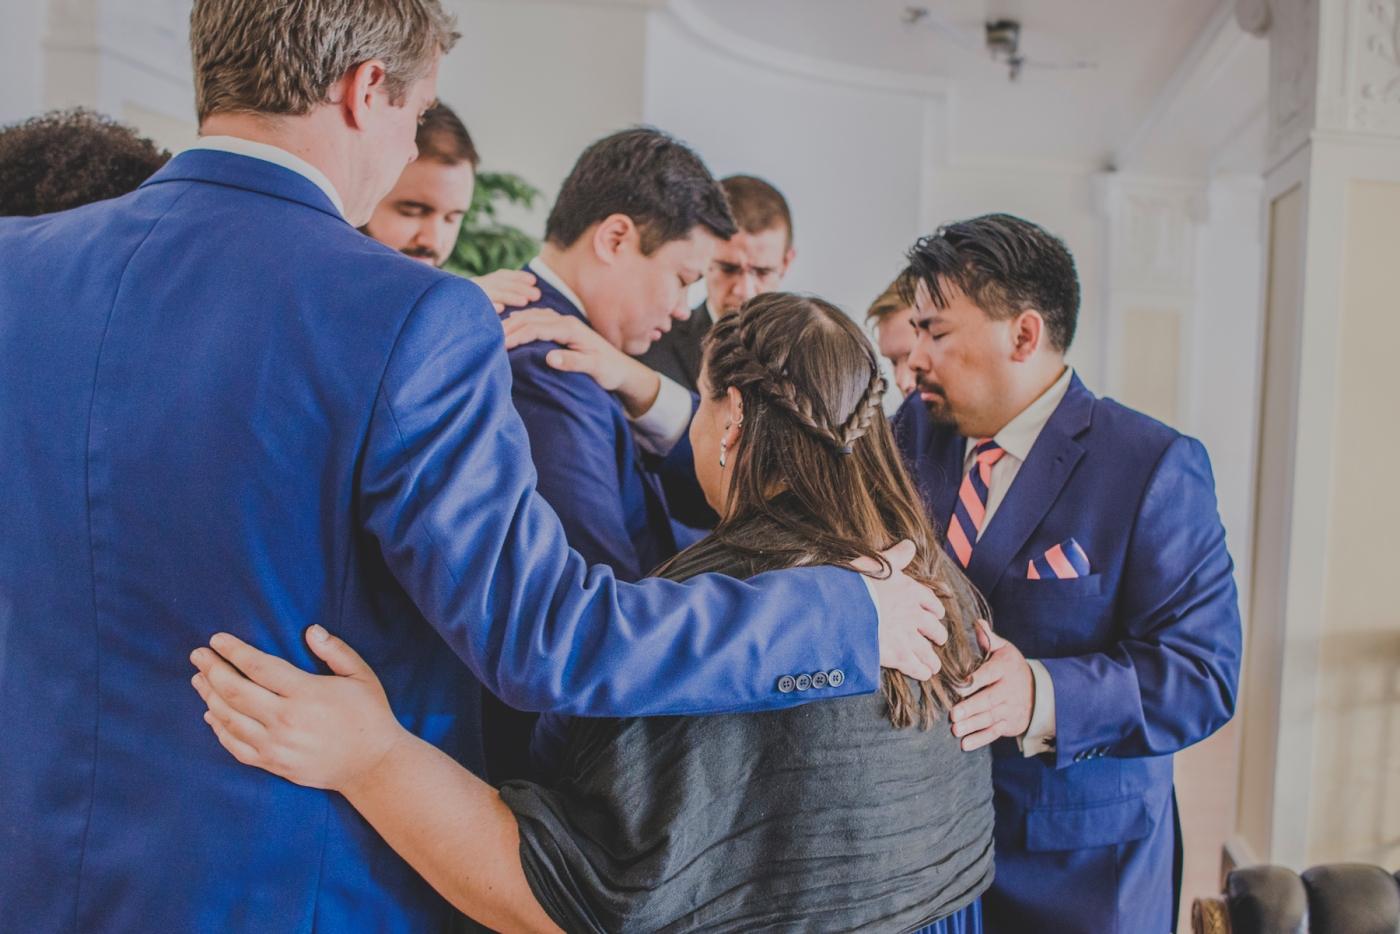 DSC_2405Everett_Wedding_Ballroom_Jane_Speleers_photography_Rachel_and_Edmund_Praying_2017